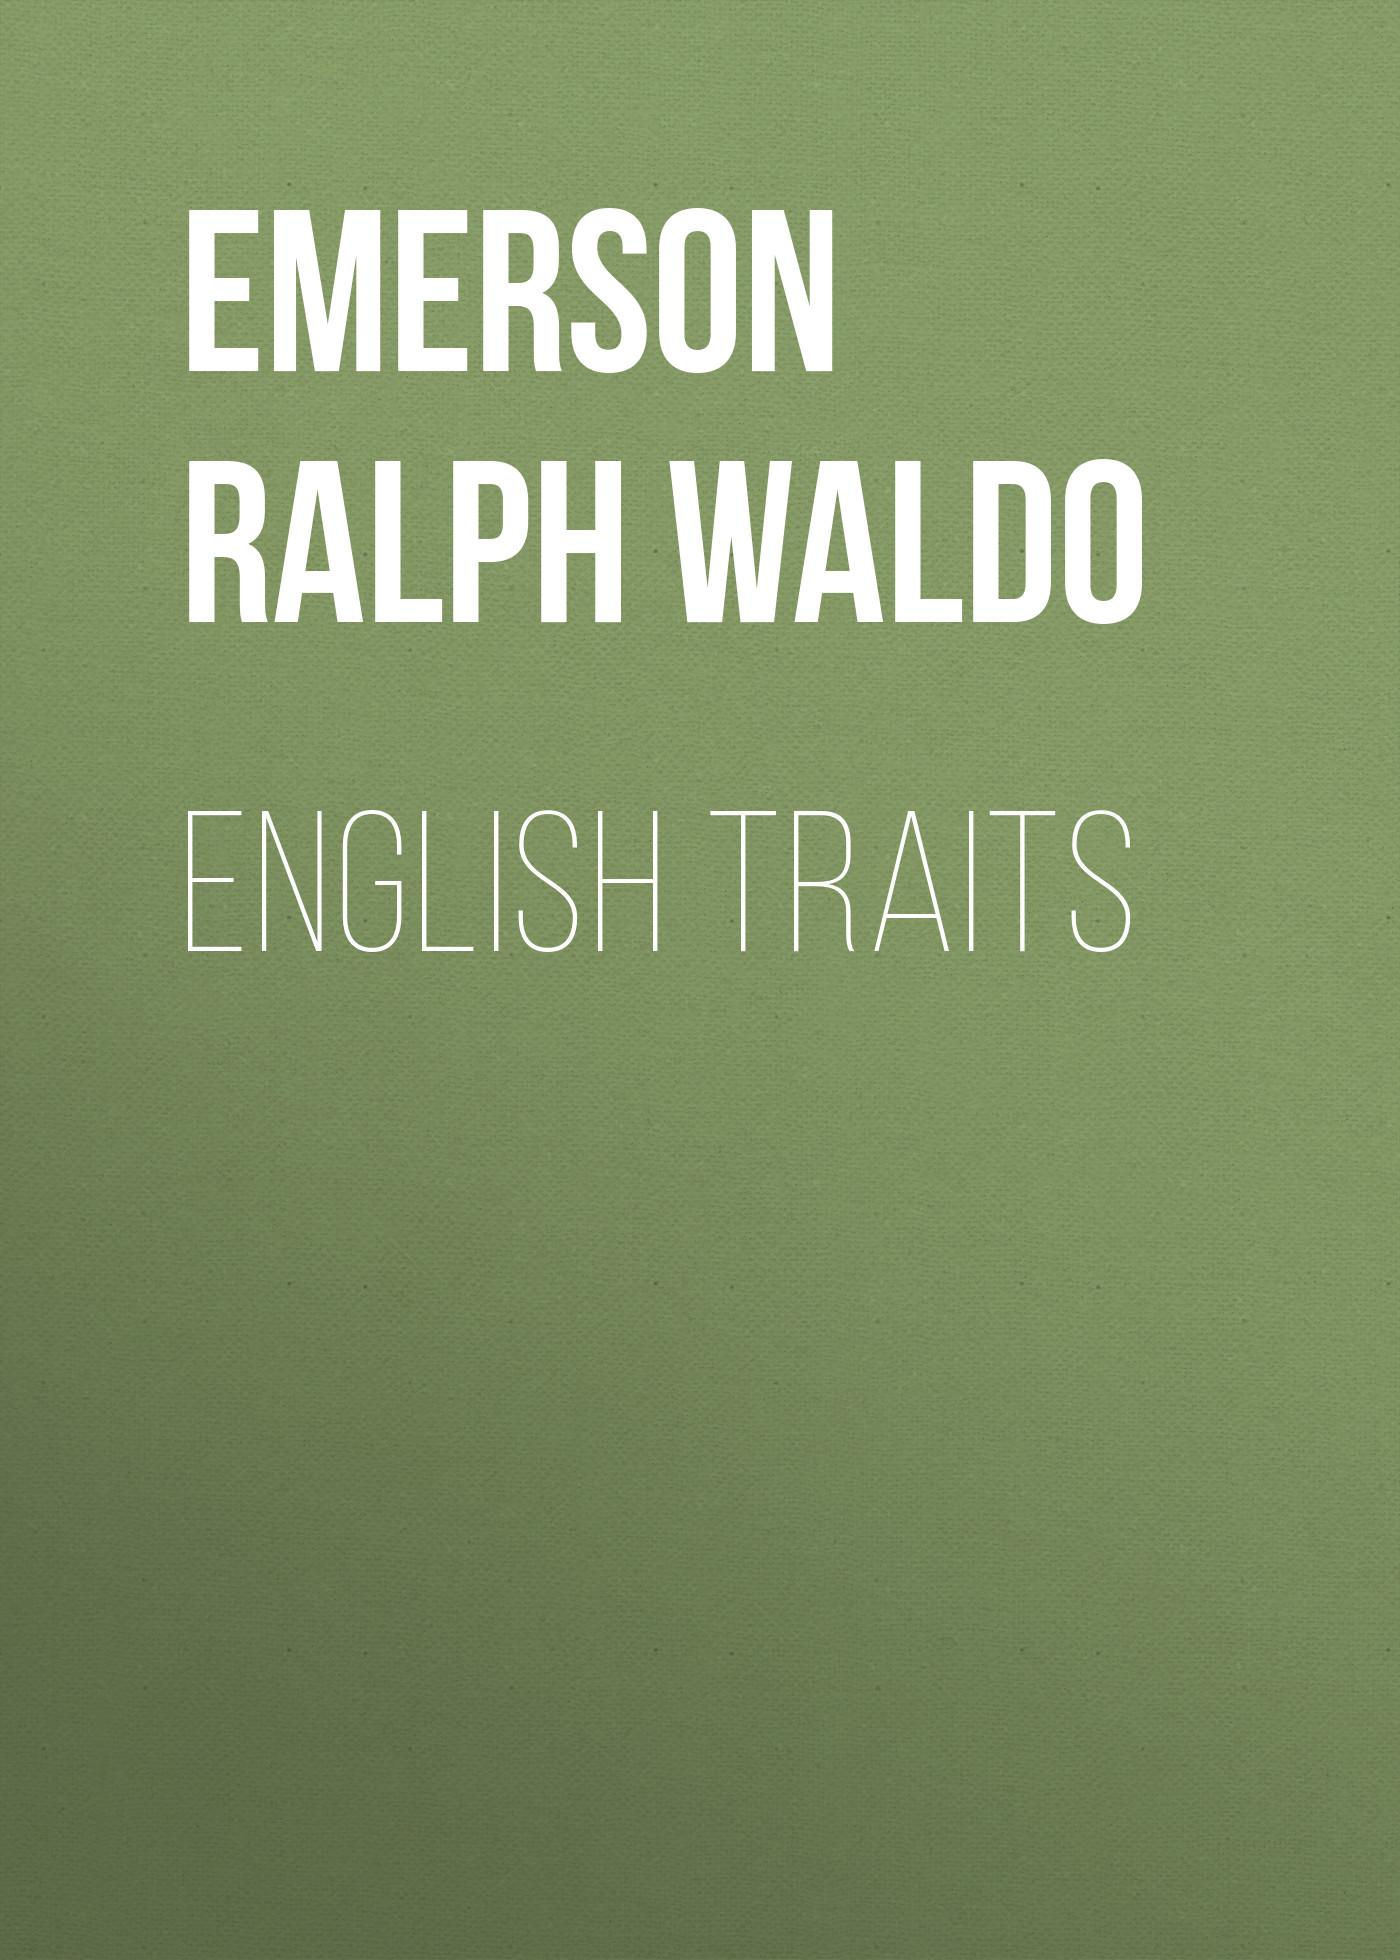 Emerson Ralph Waldo English Traits стоимость